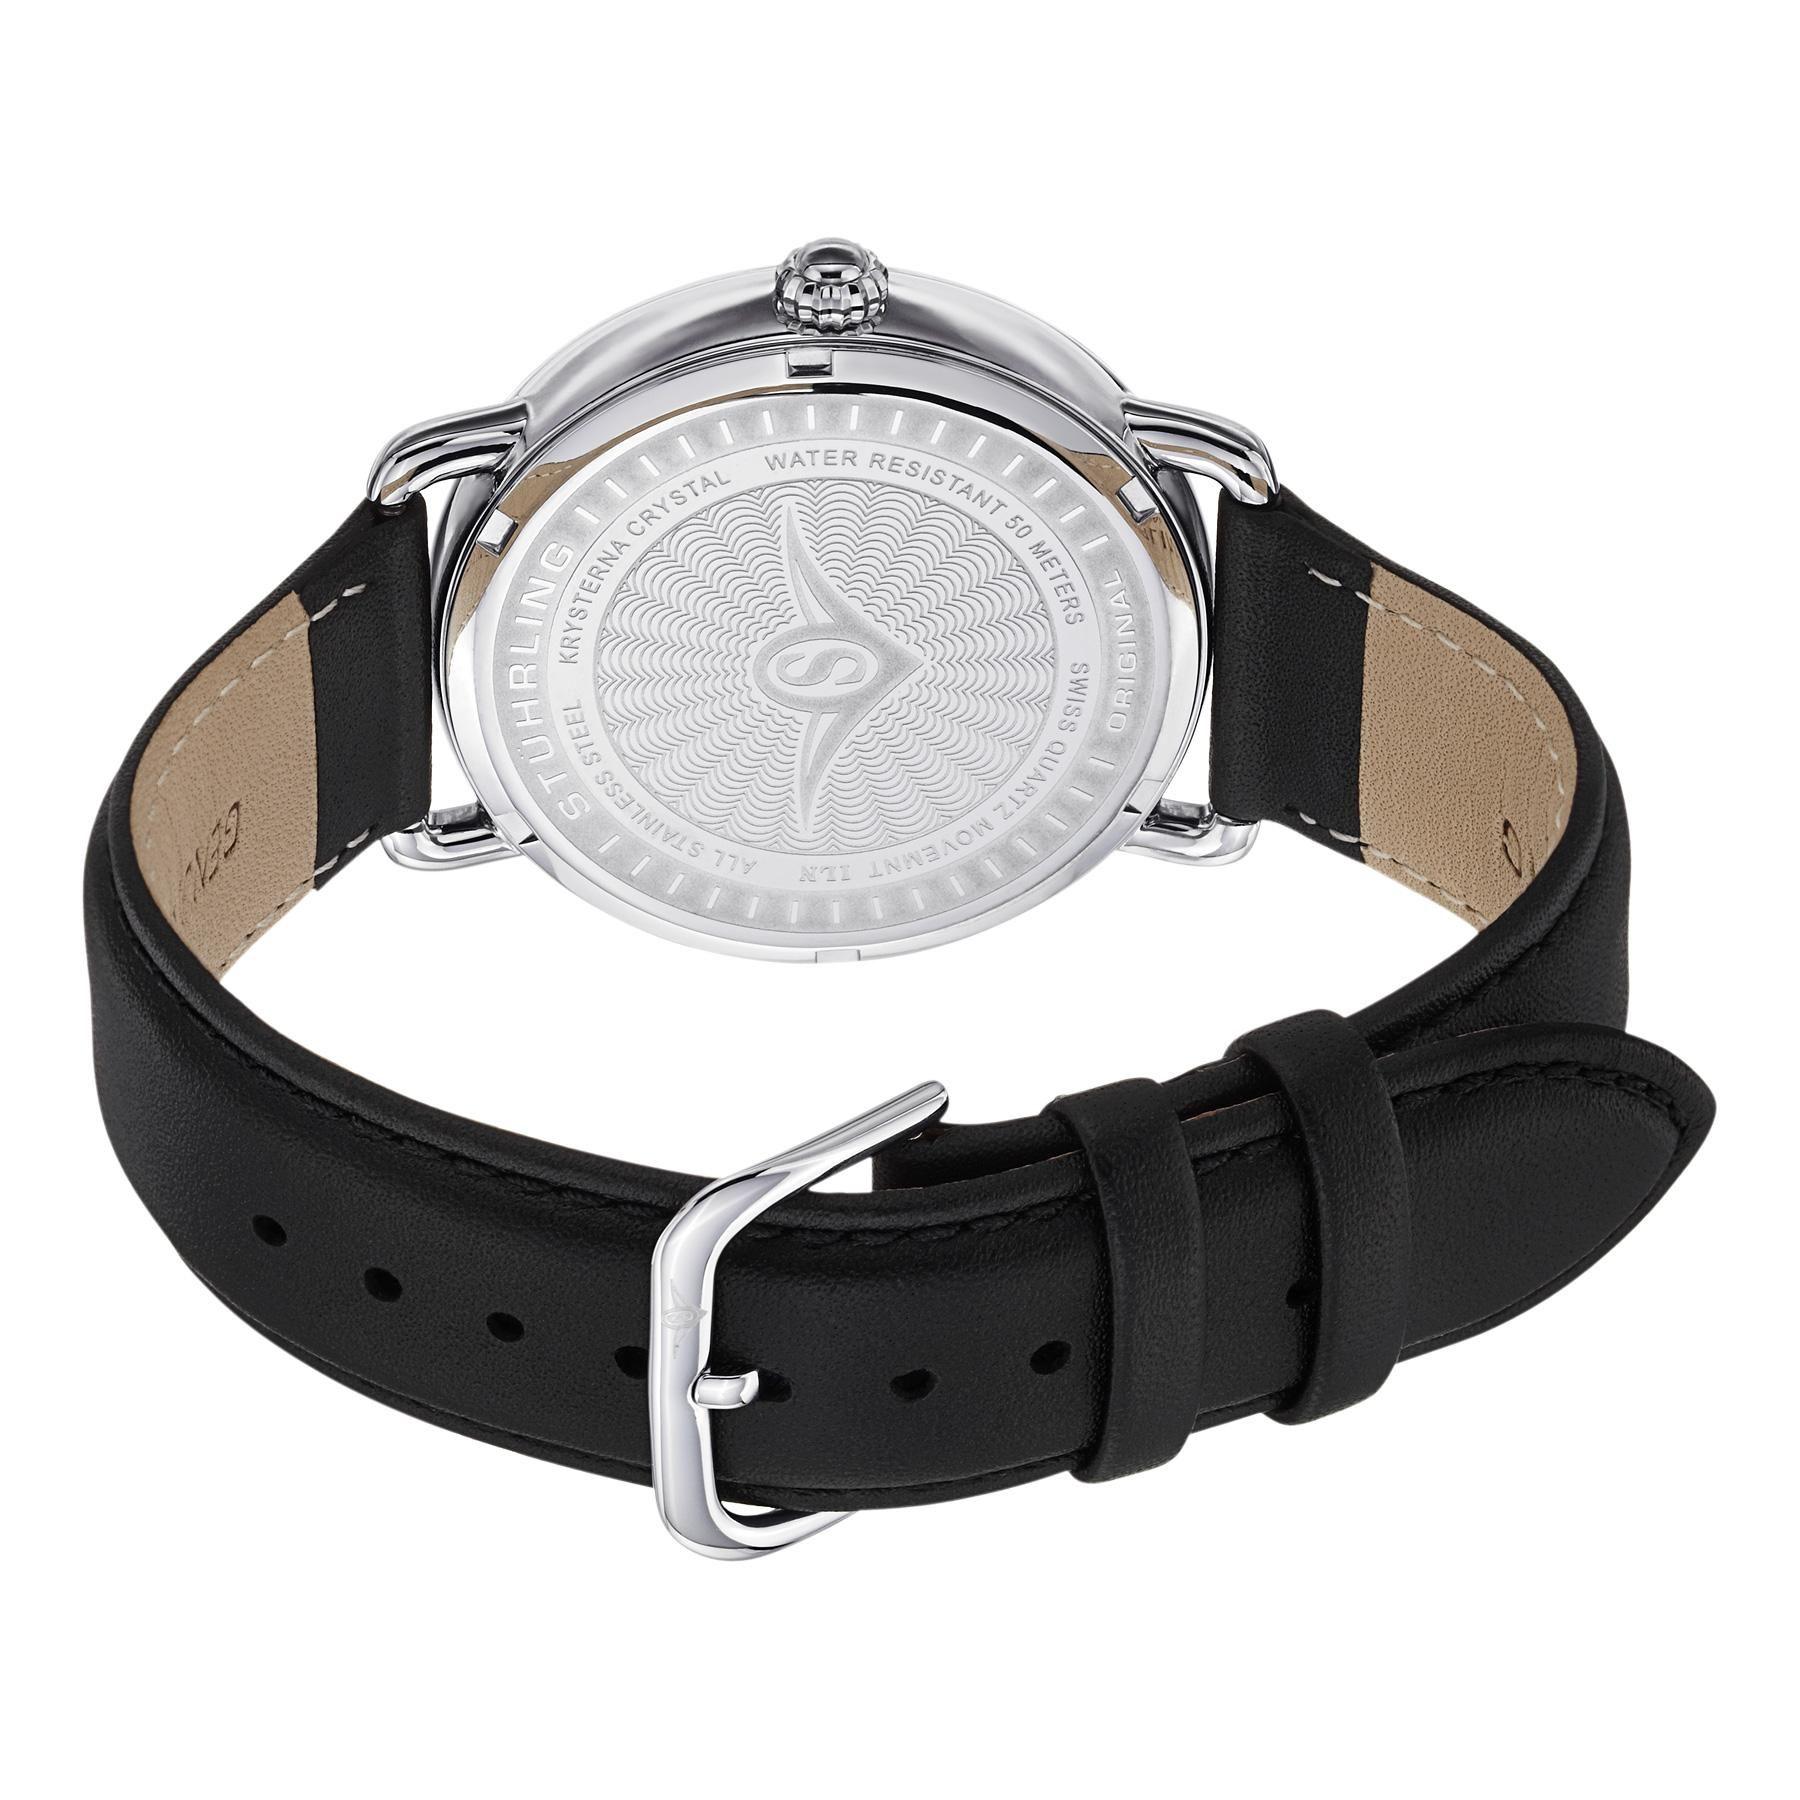 Stuhrling Original Ascot Mens Designer Watch Swiss Quartz Silver Dial Date Wrist Watch For Men Mens Designer Watches Mens Dress Watches Mens Watches Black [ 1800 x 1800 Pixel ]